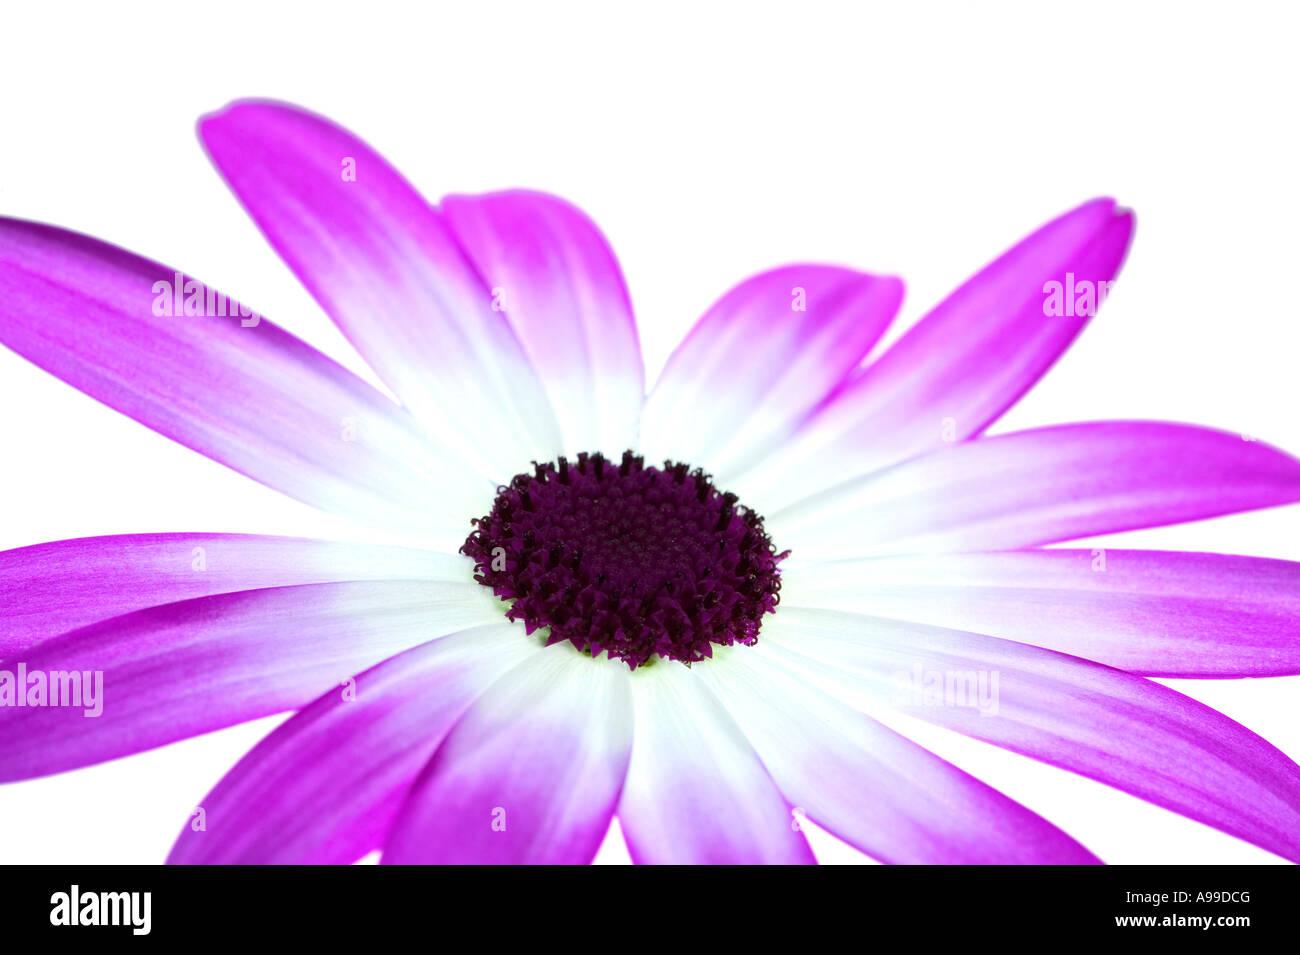 Senetti Magenta Bi Color isolated on white - Stock Image